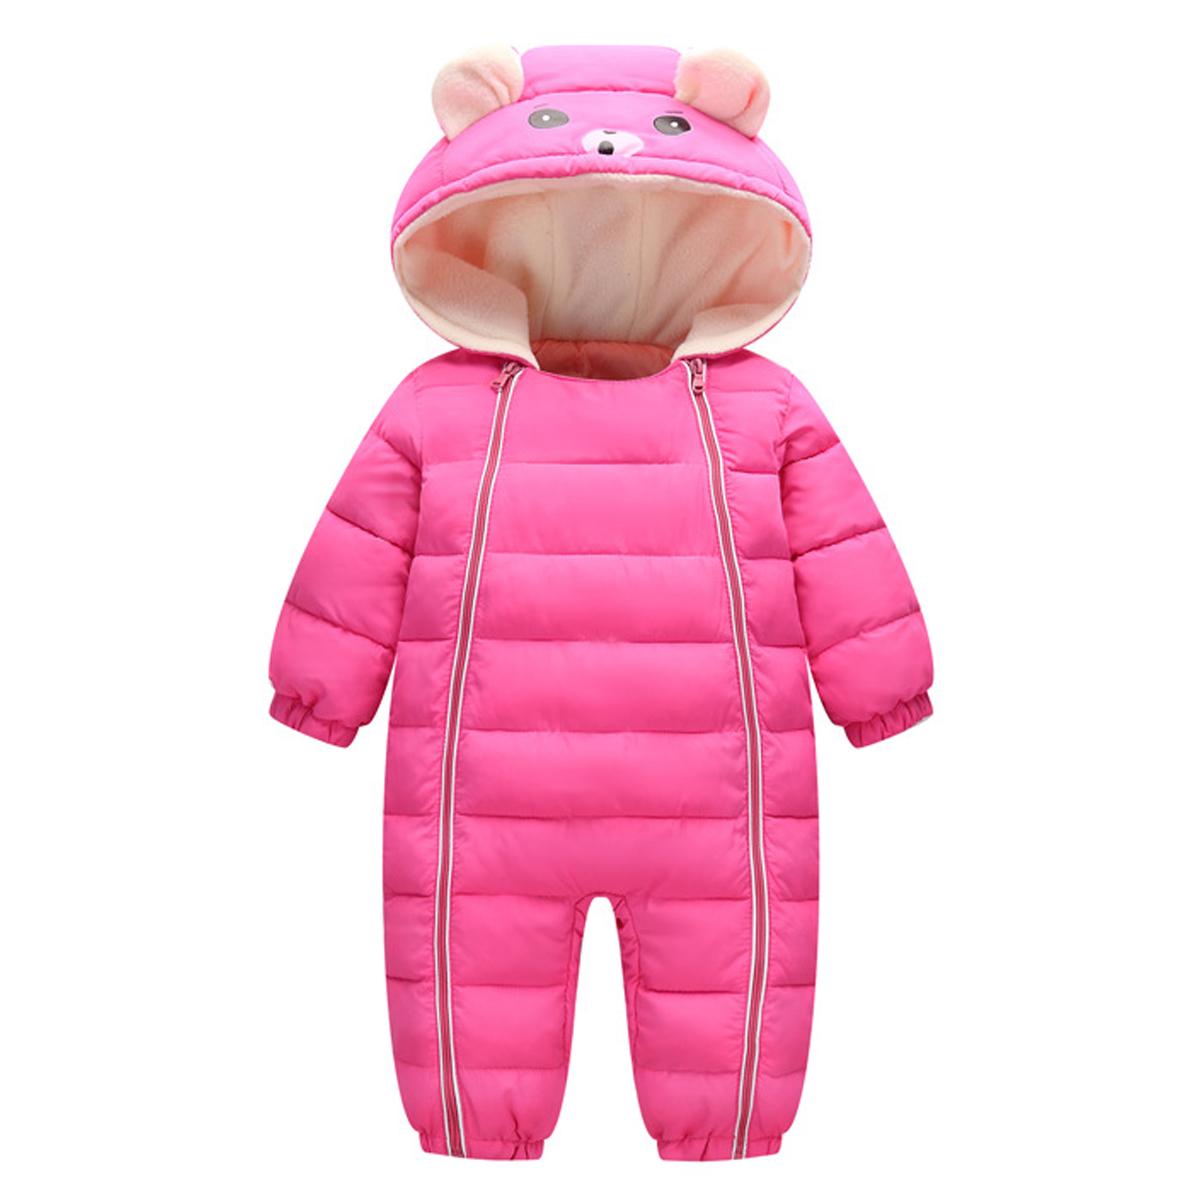 b5f820c88 Newborn Baby Snowsuit Boy Girl Romper Jumpsuit Winter Clothes ...